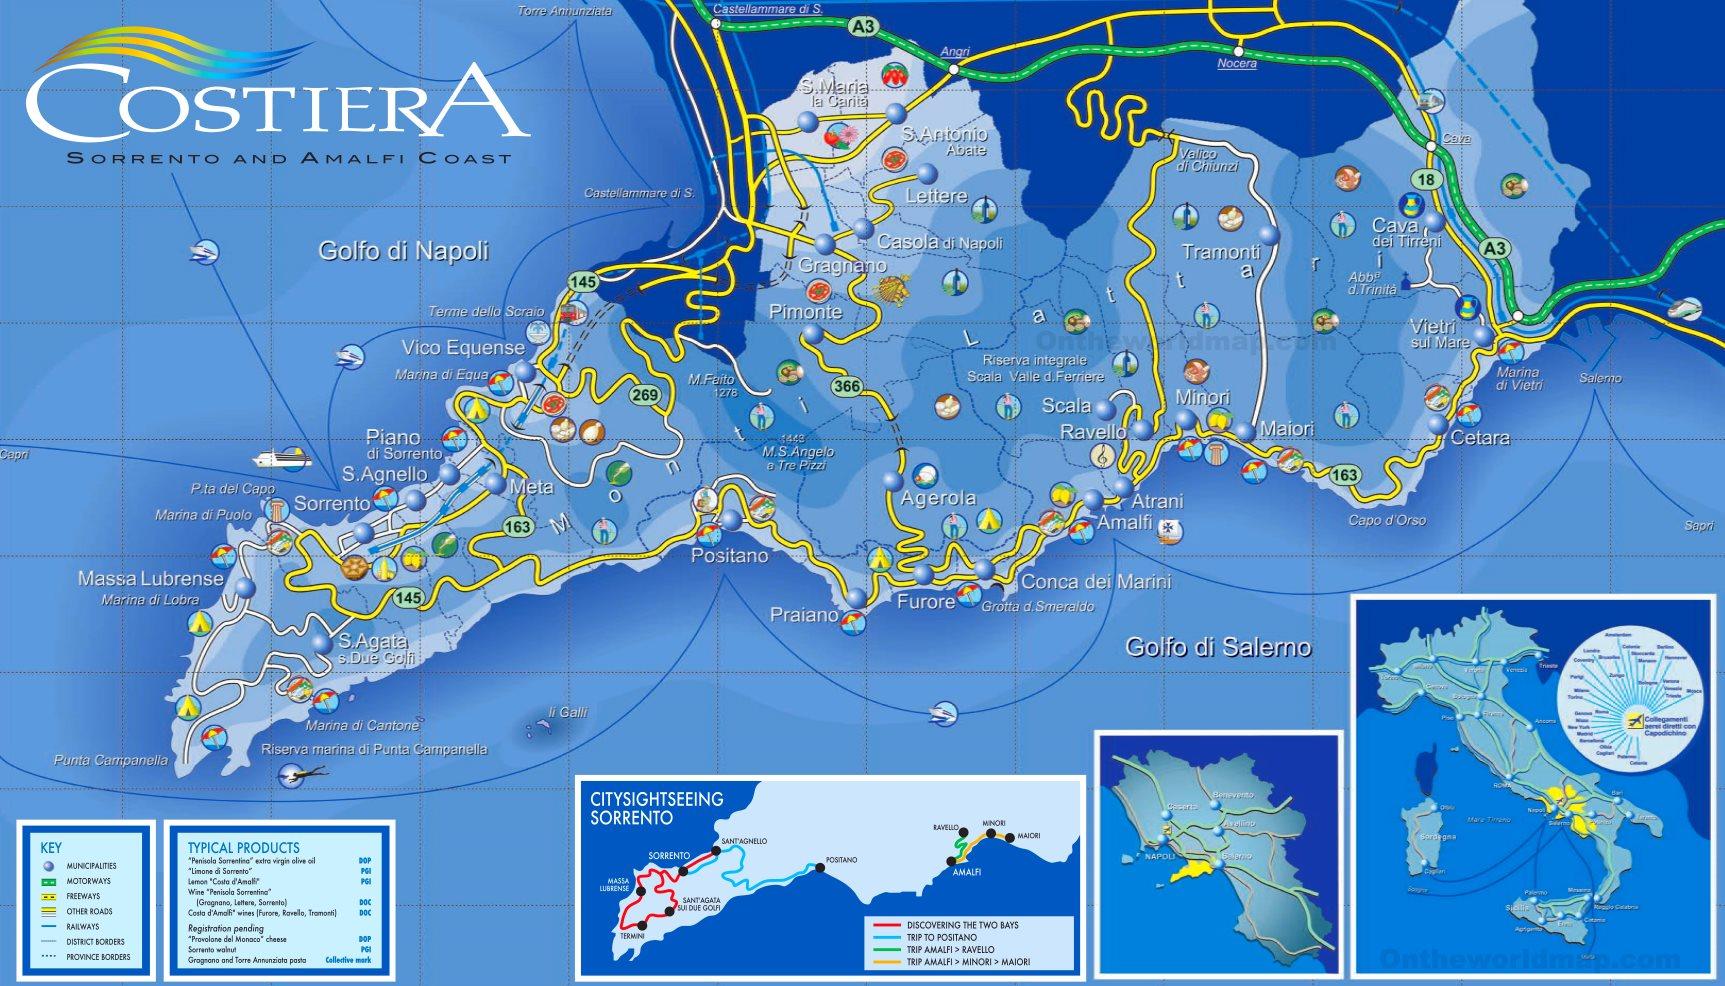 Sorrento Peninsula and Amalfi Coast Map on genoa map, cagliari map, venice map, lake como map, salerno map, croatia map, spain map, cinque terre map, greece map, sorrento map, france map, umbria map, sicily map, capri map, europe map, italy map, positano map, naples map, tuscany map, turin map,